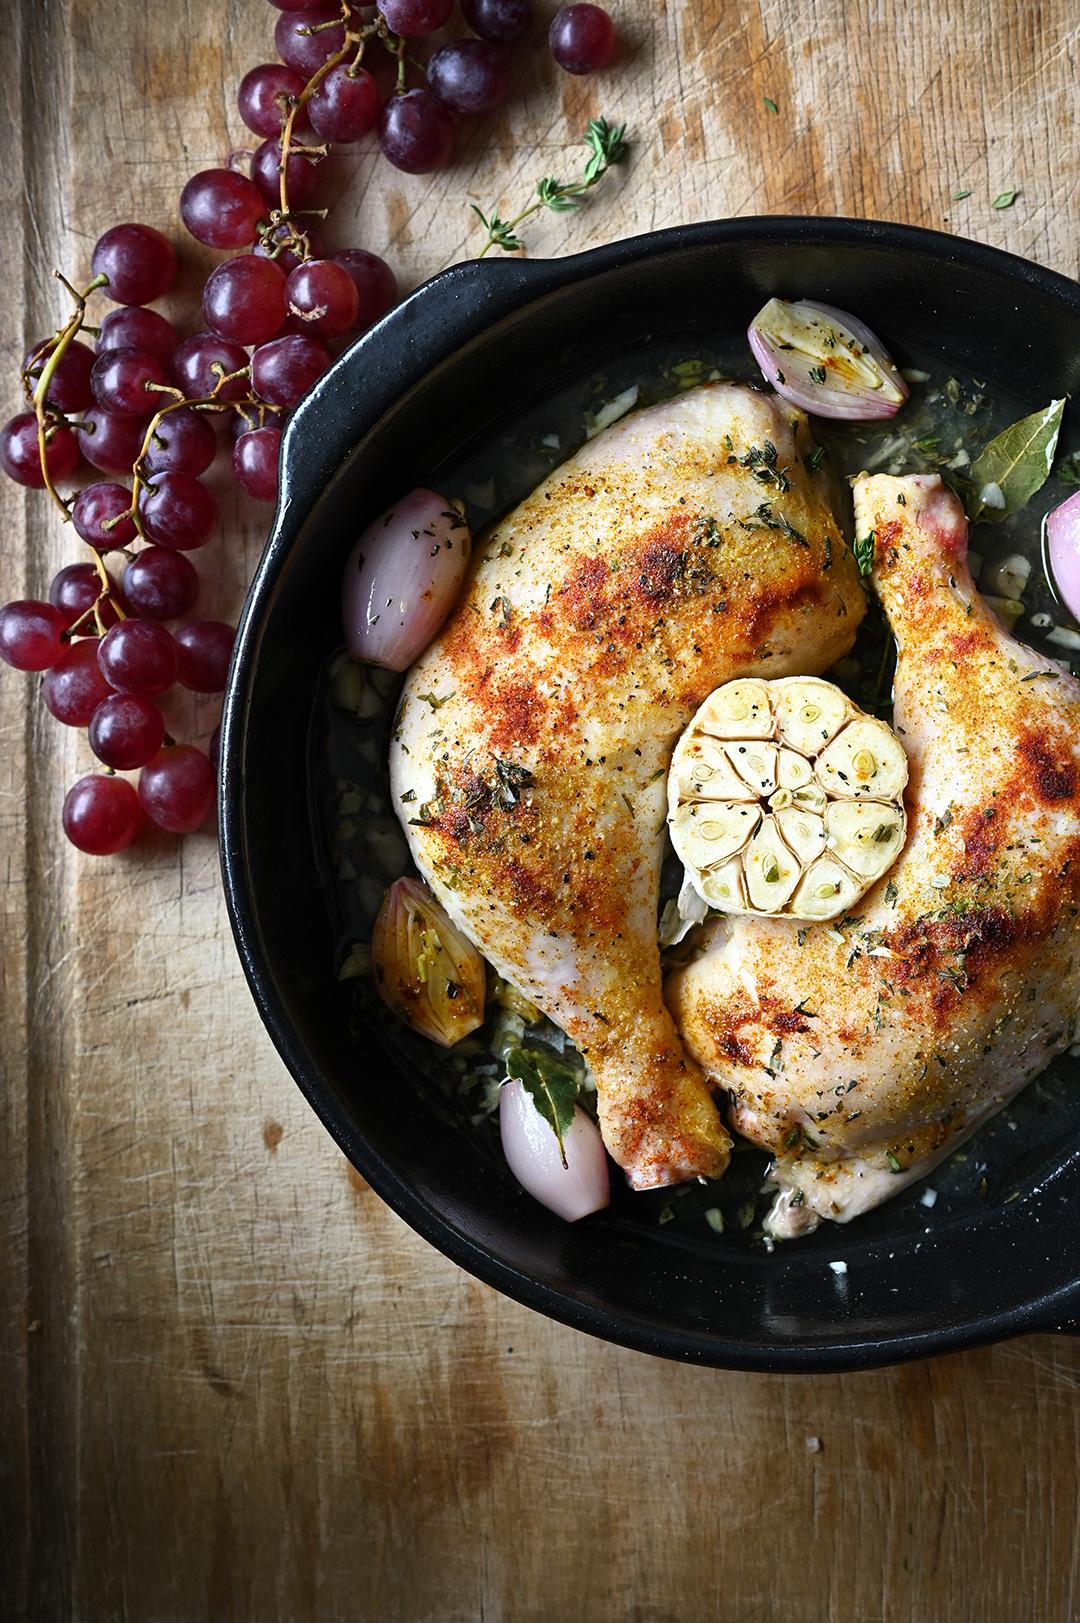 serving dumplings | Geroosterde kippenboutjes met knoflook en druiven